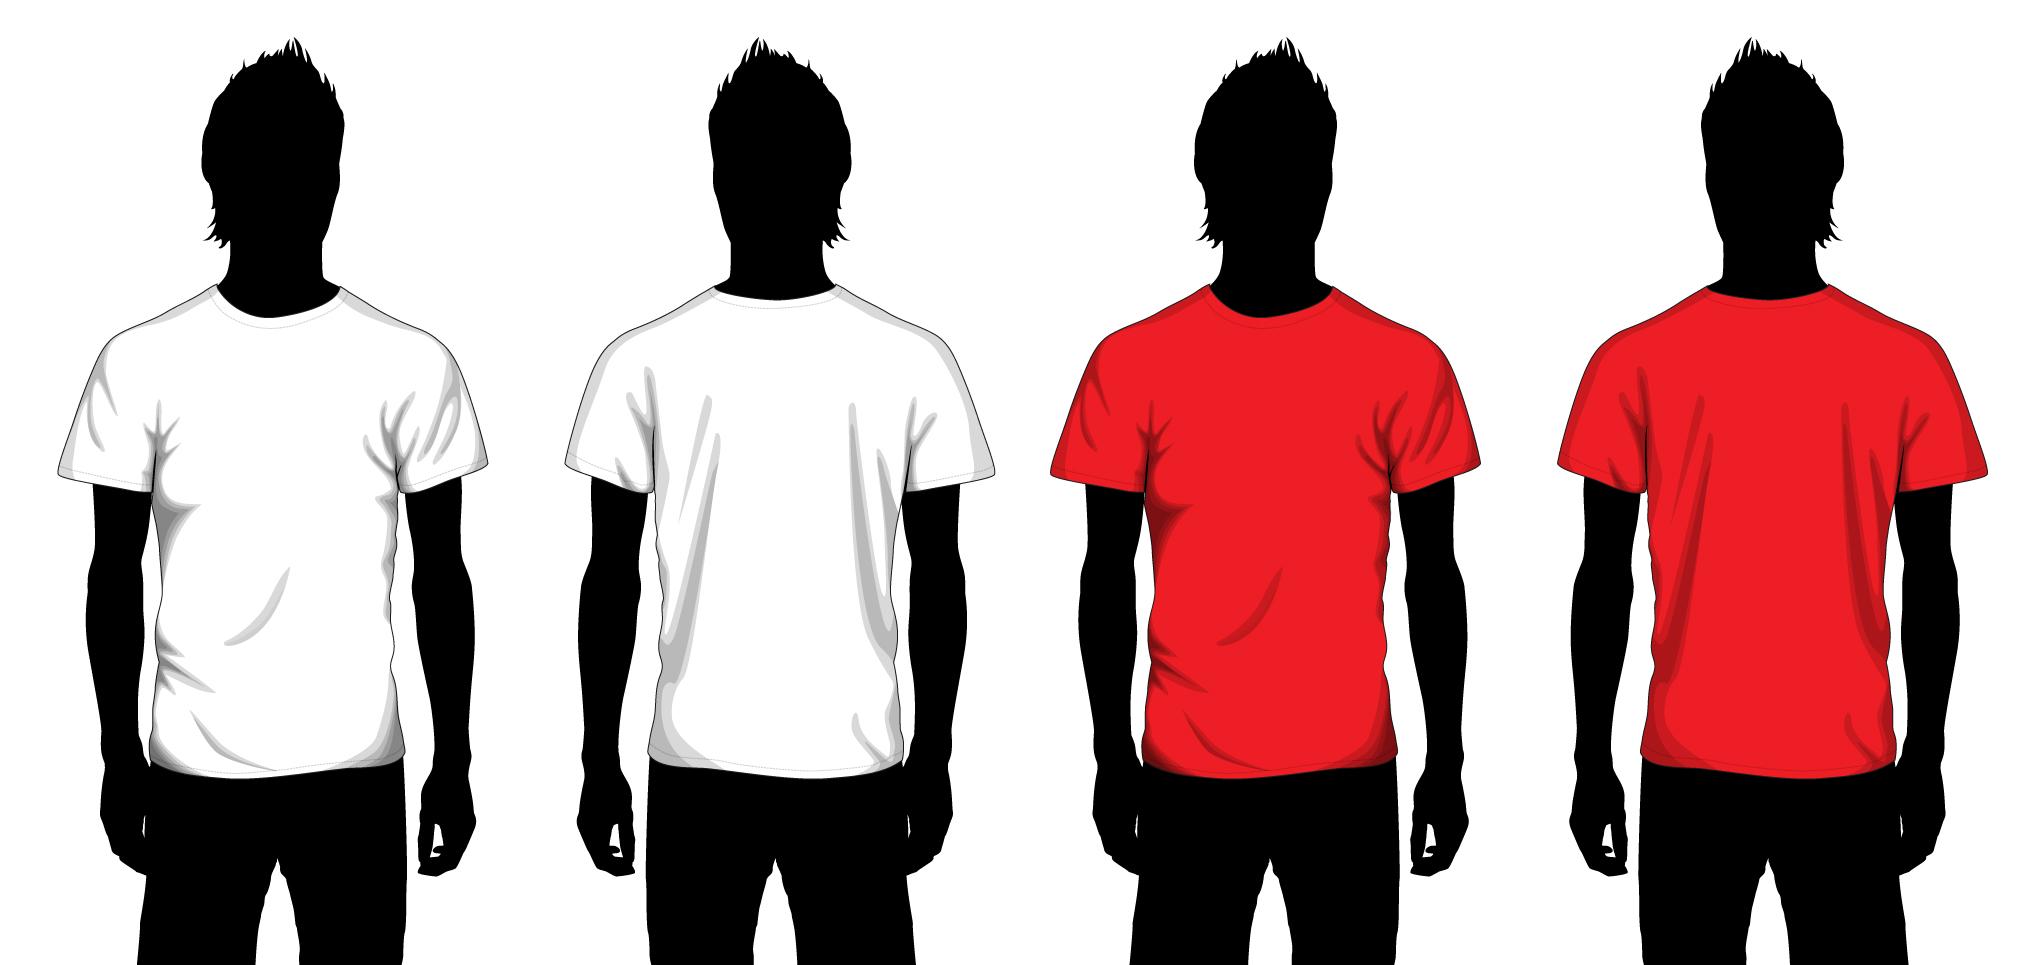 9dedaa63 T Shirt Outline Template | Free download best T Shirt Outline ...